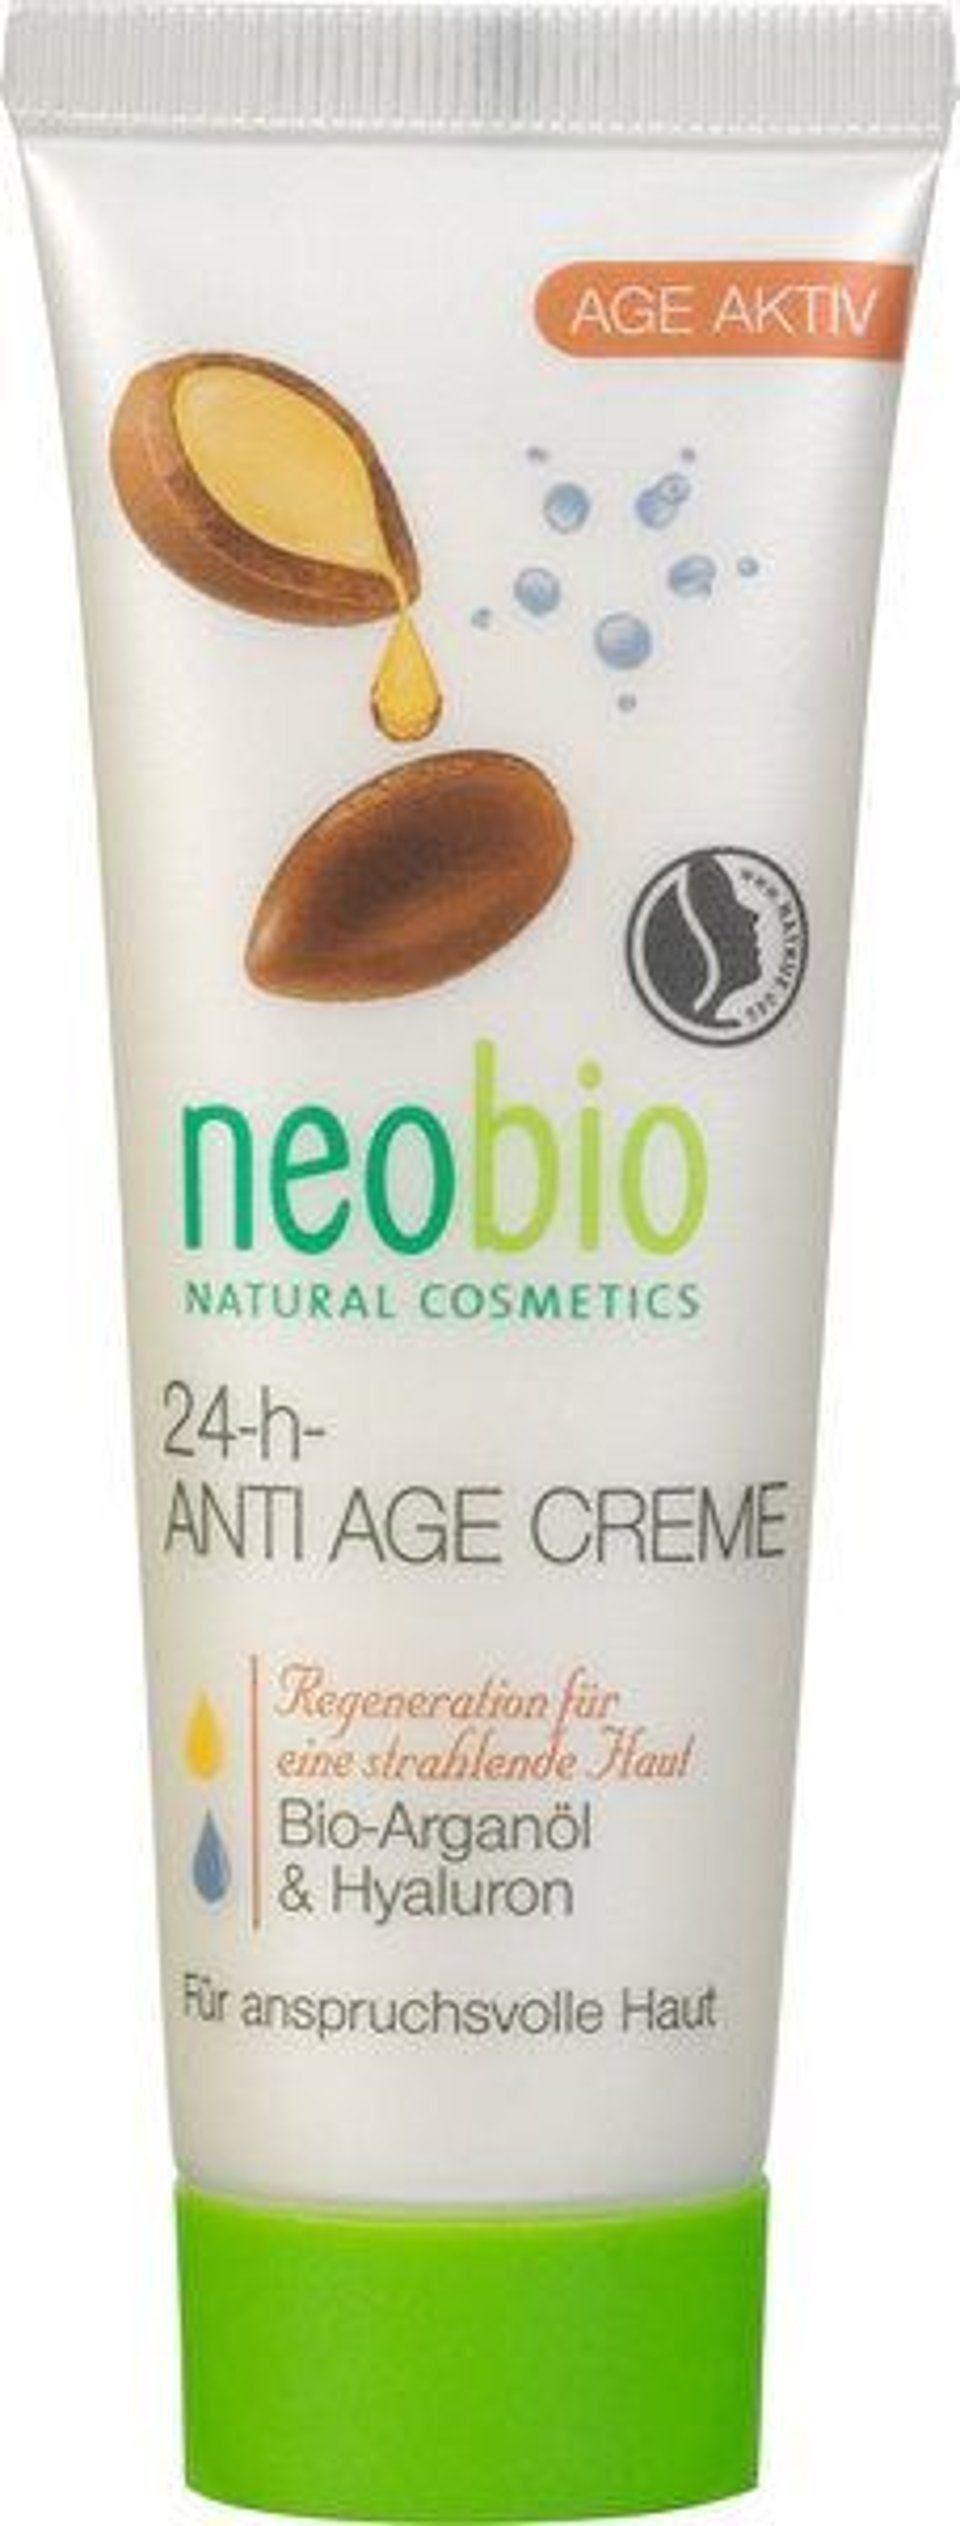 24-h anti-age creme